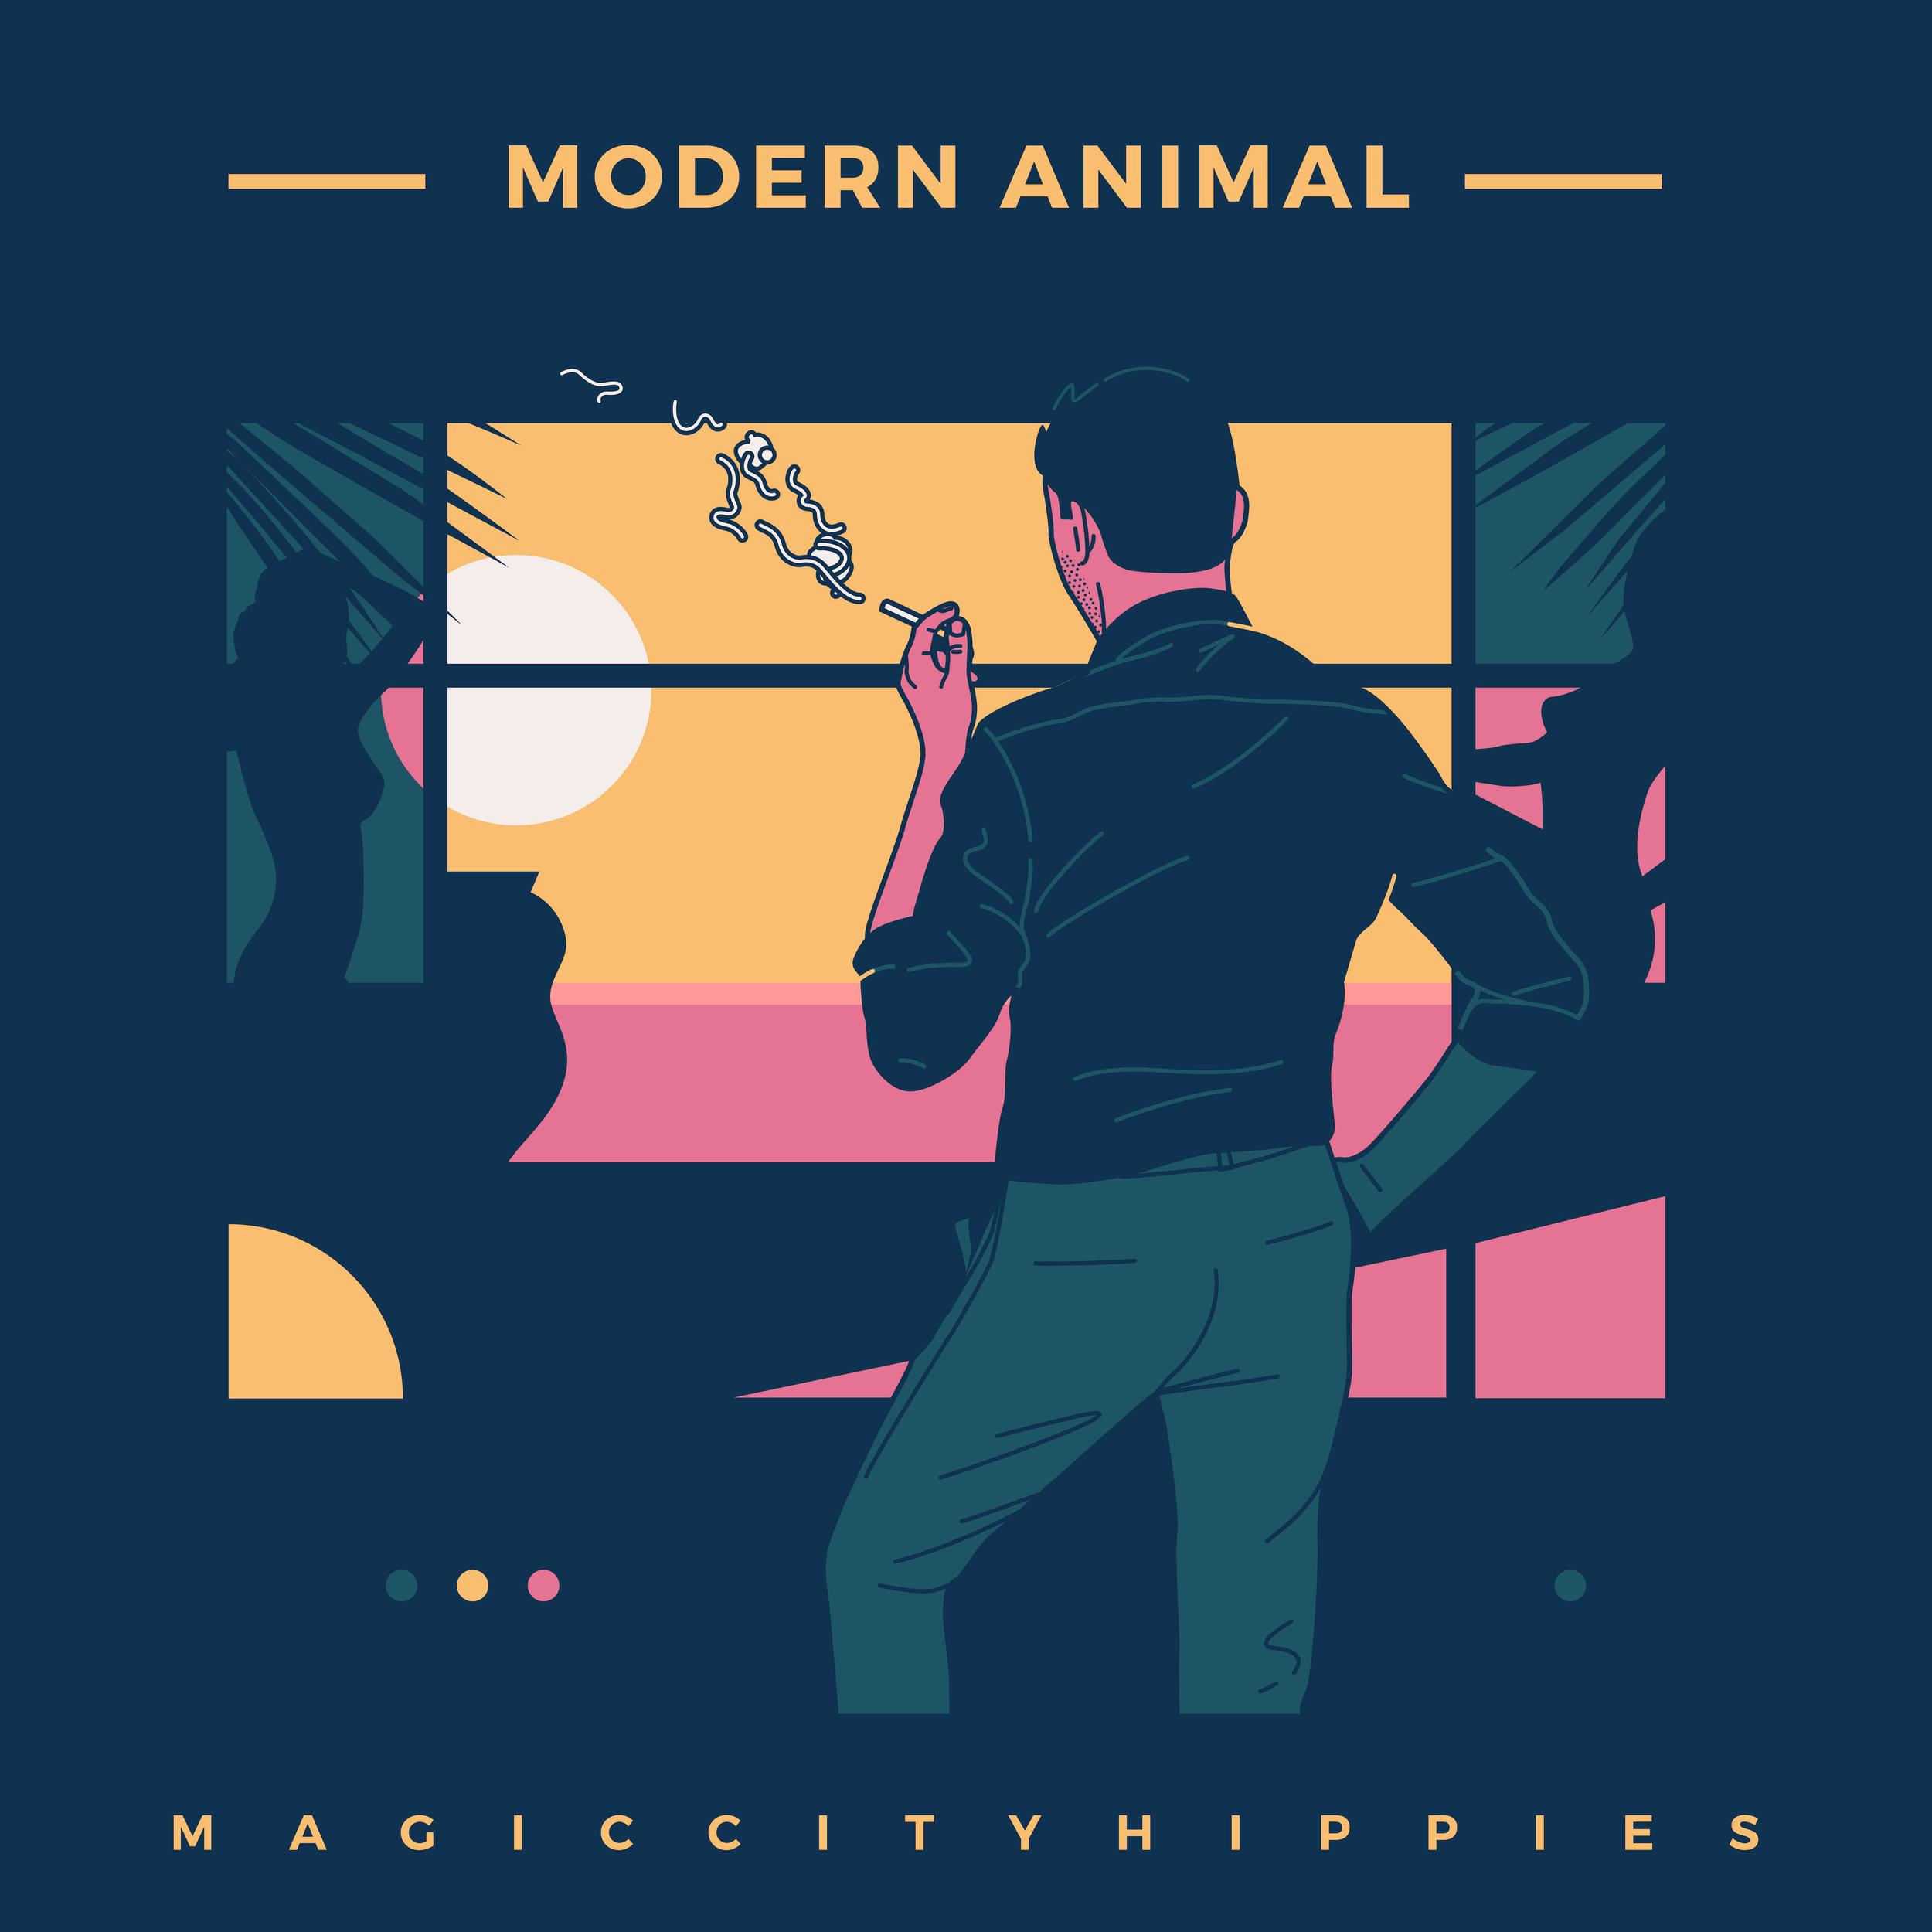 Modern_Animal (1).jpg